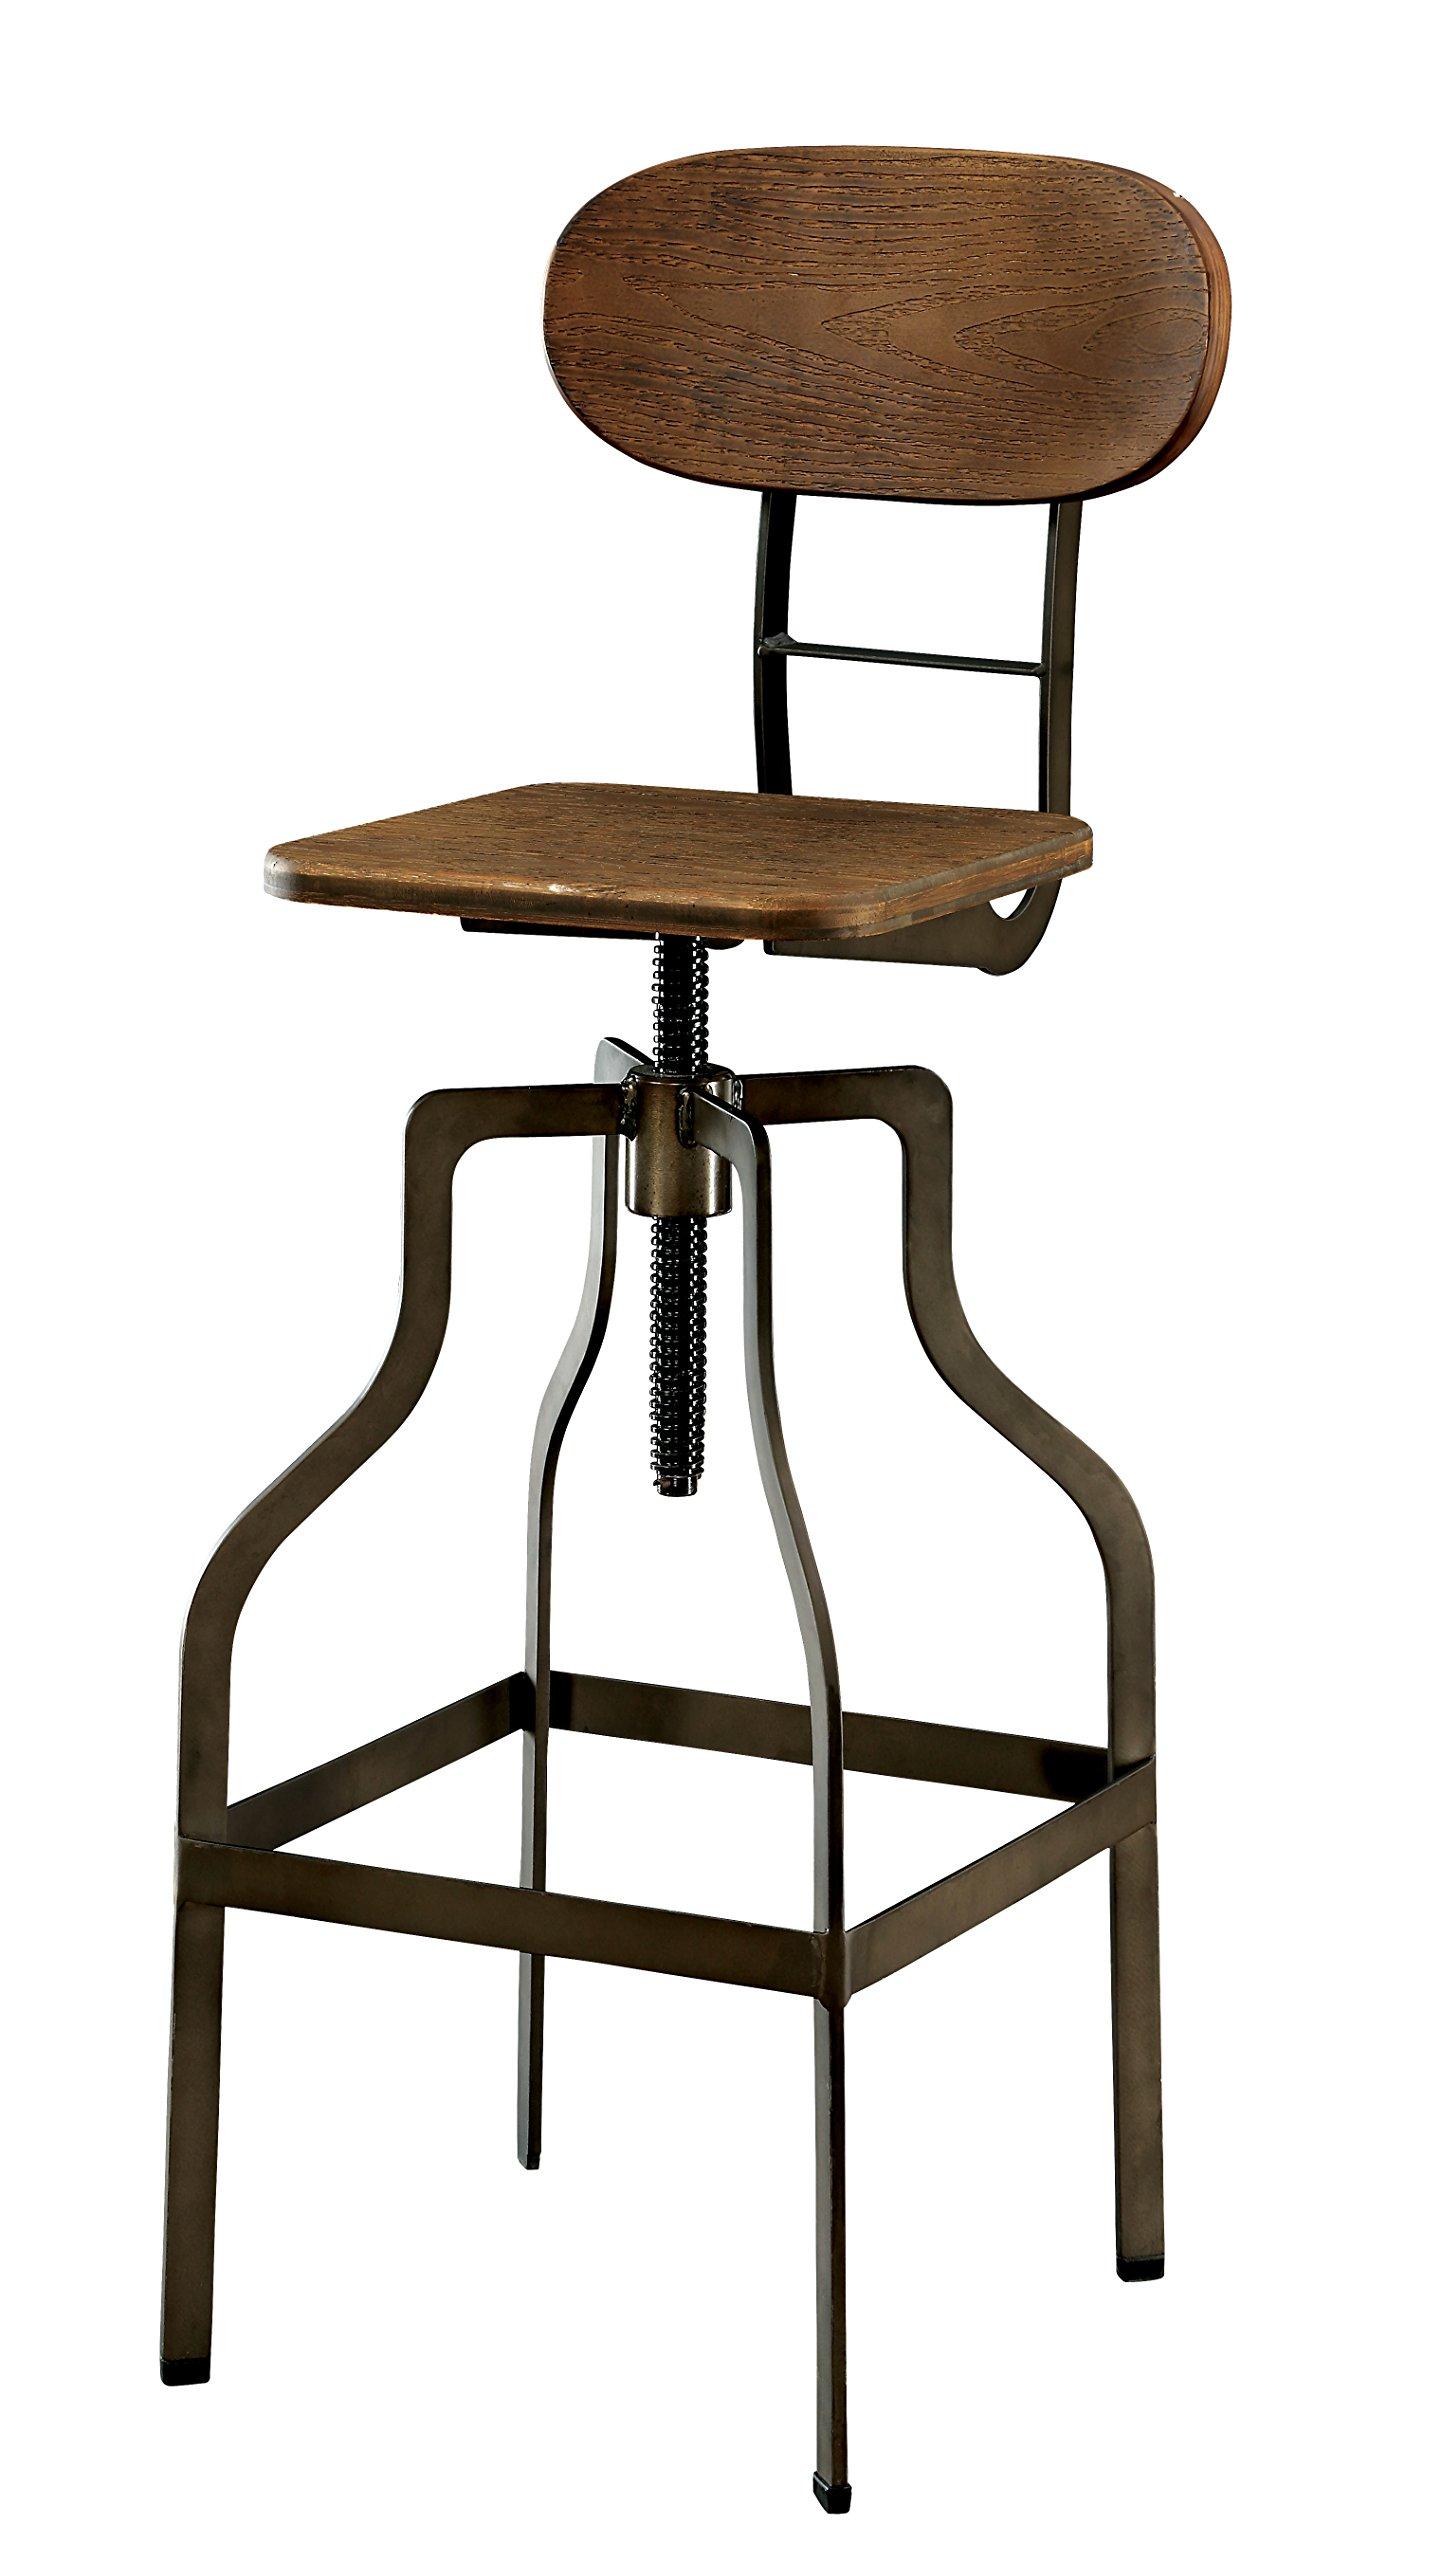 Furniture of America Alavus Industrial Height-Adjustable Swivel Barstool, Oak by Furniture of America